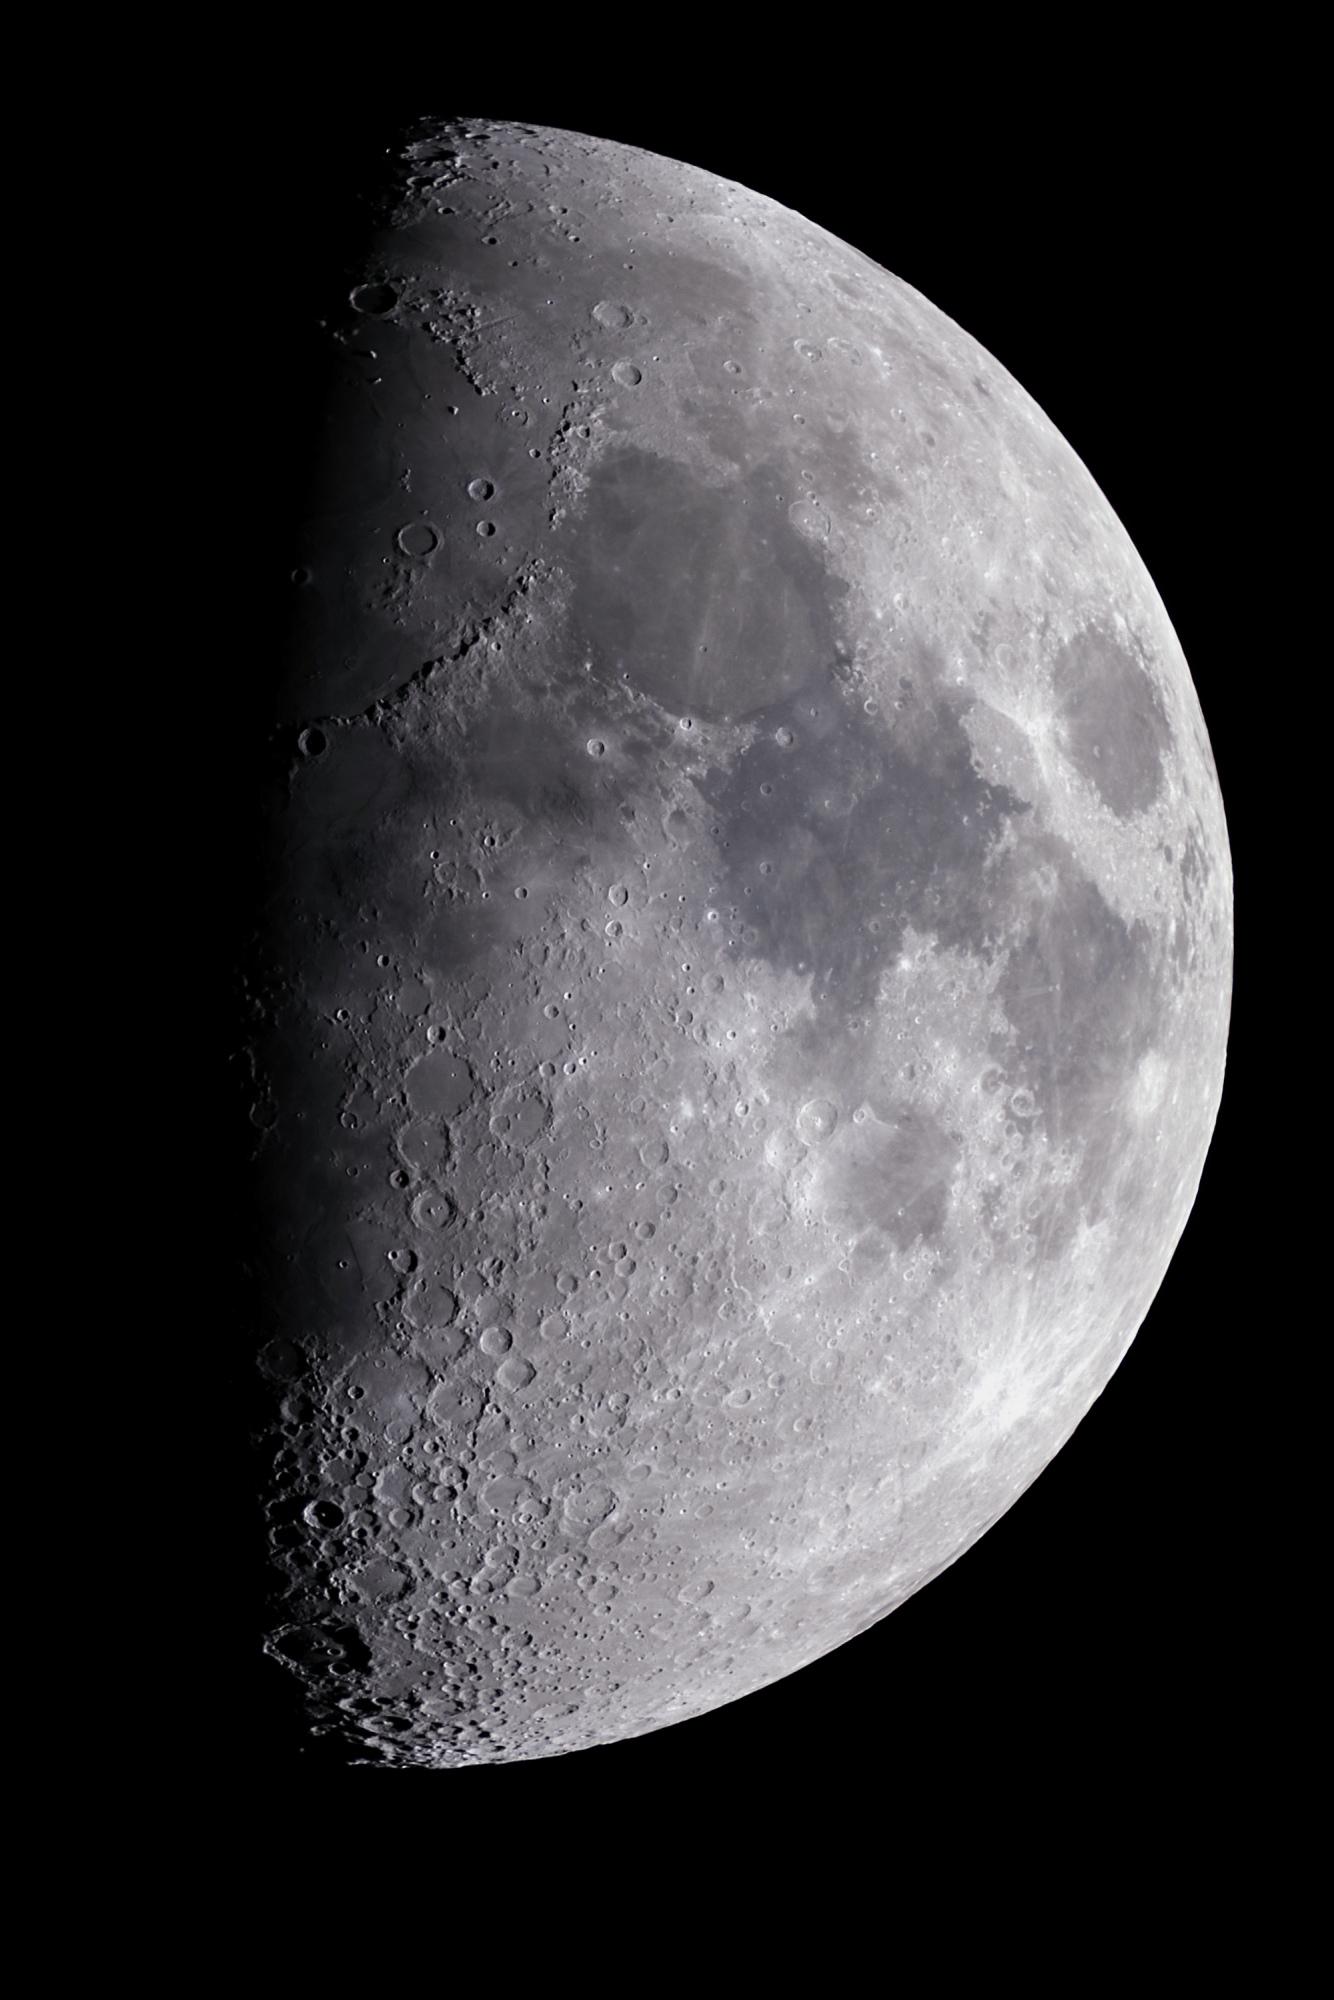 lune21022021bisform.thumb.jpg.3b8b084718a4a09223a40015e69fb6f7.jpg